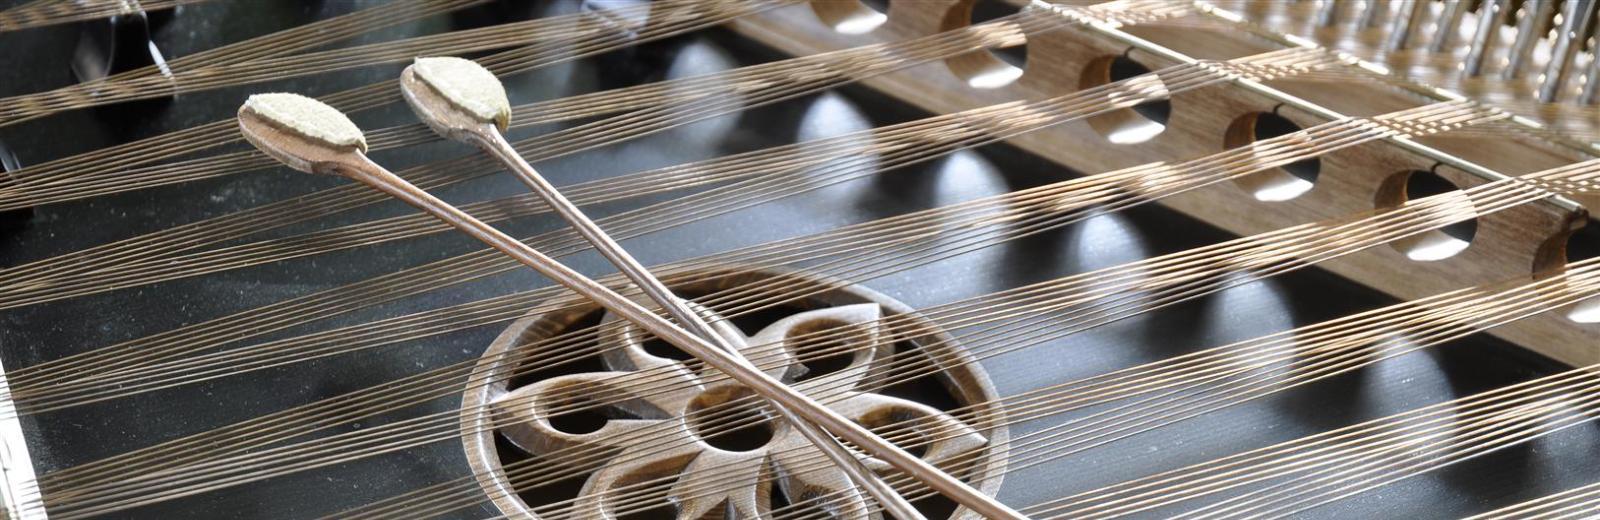 Swiss folk music: 5 traditional instruments | Swiss Society